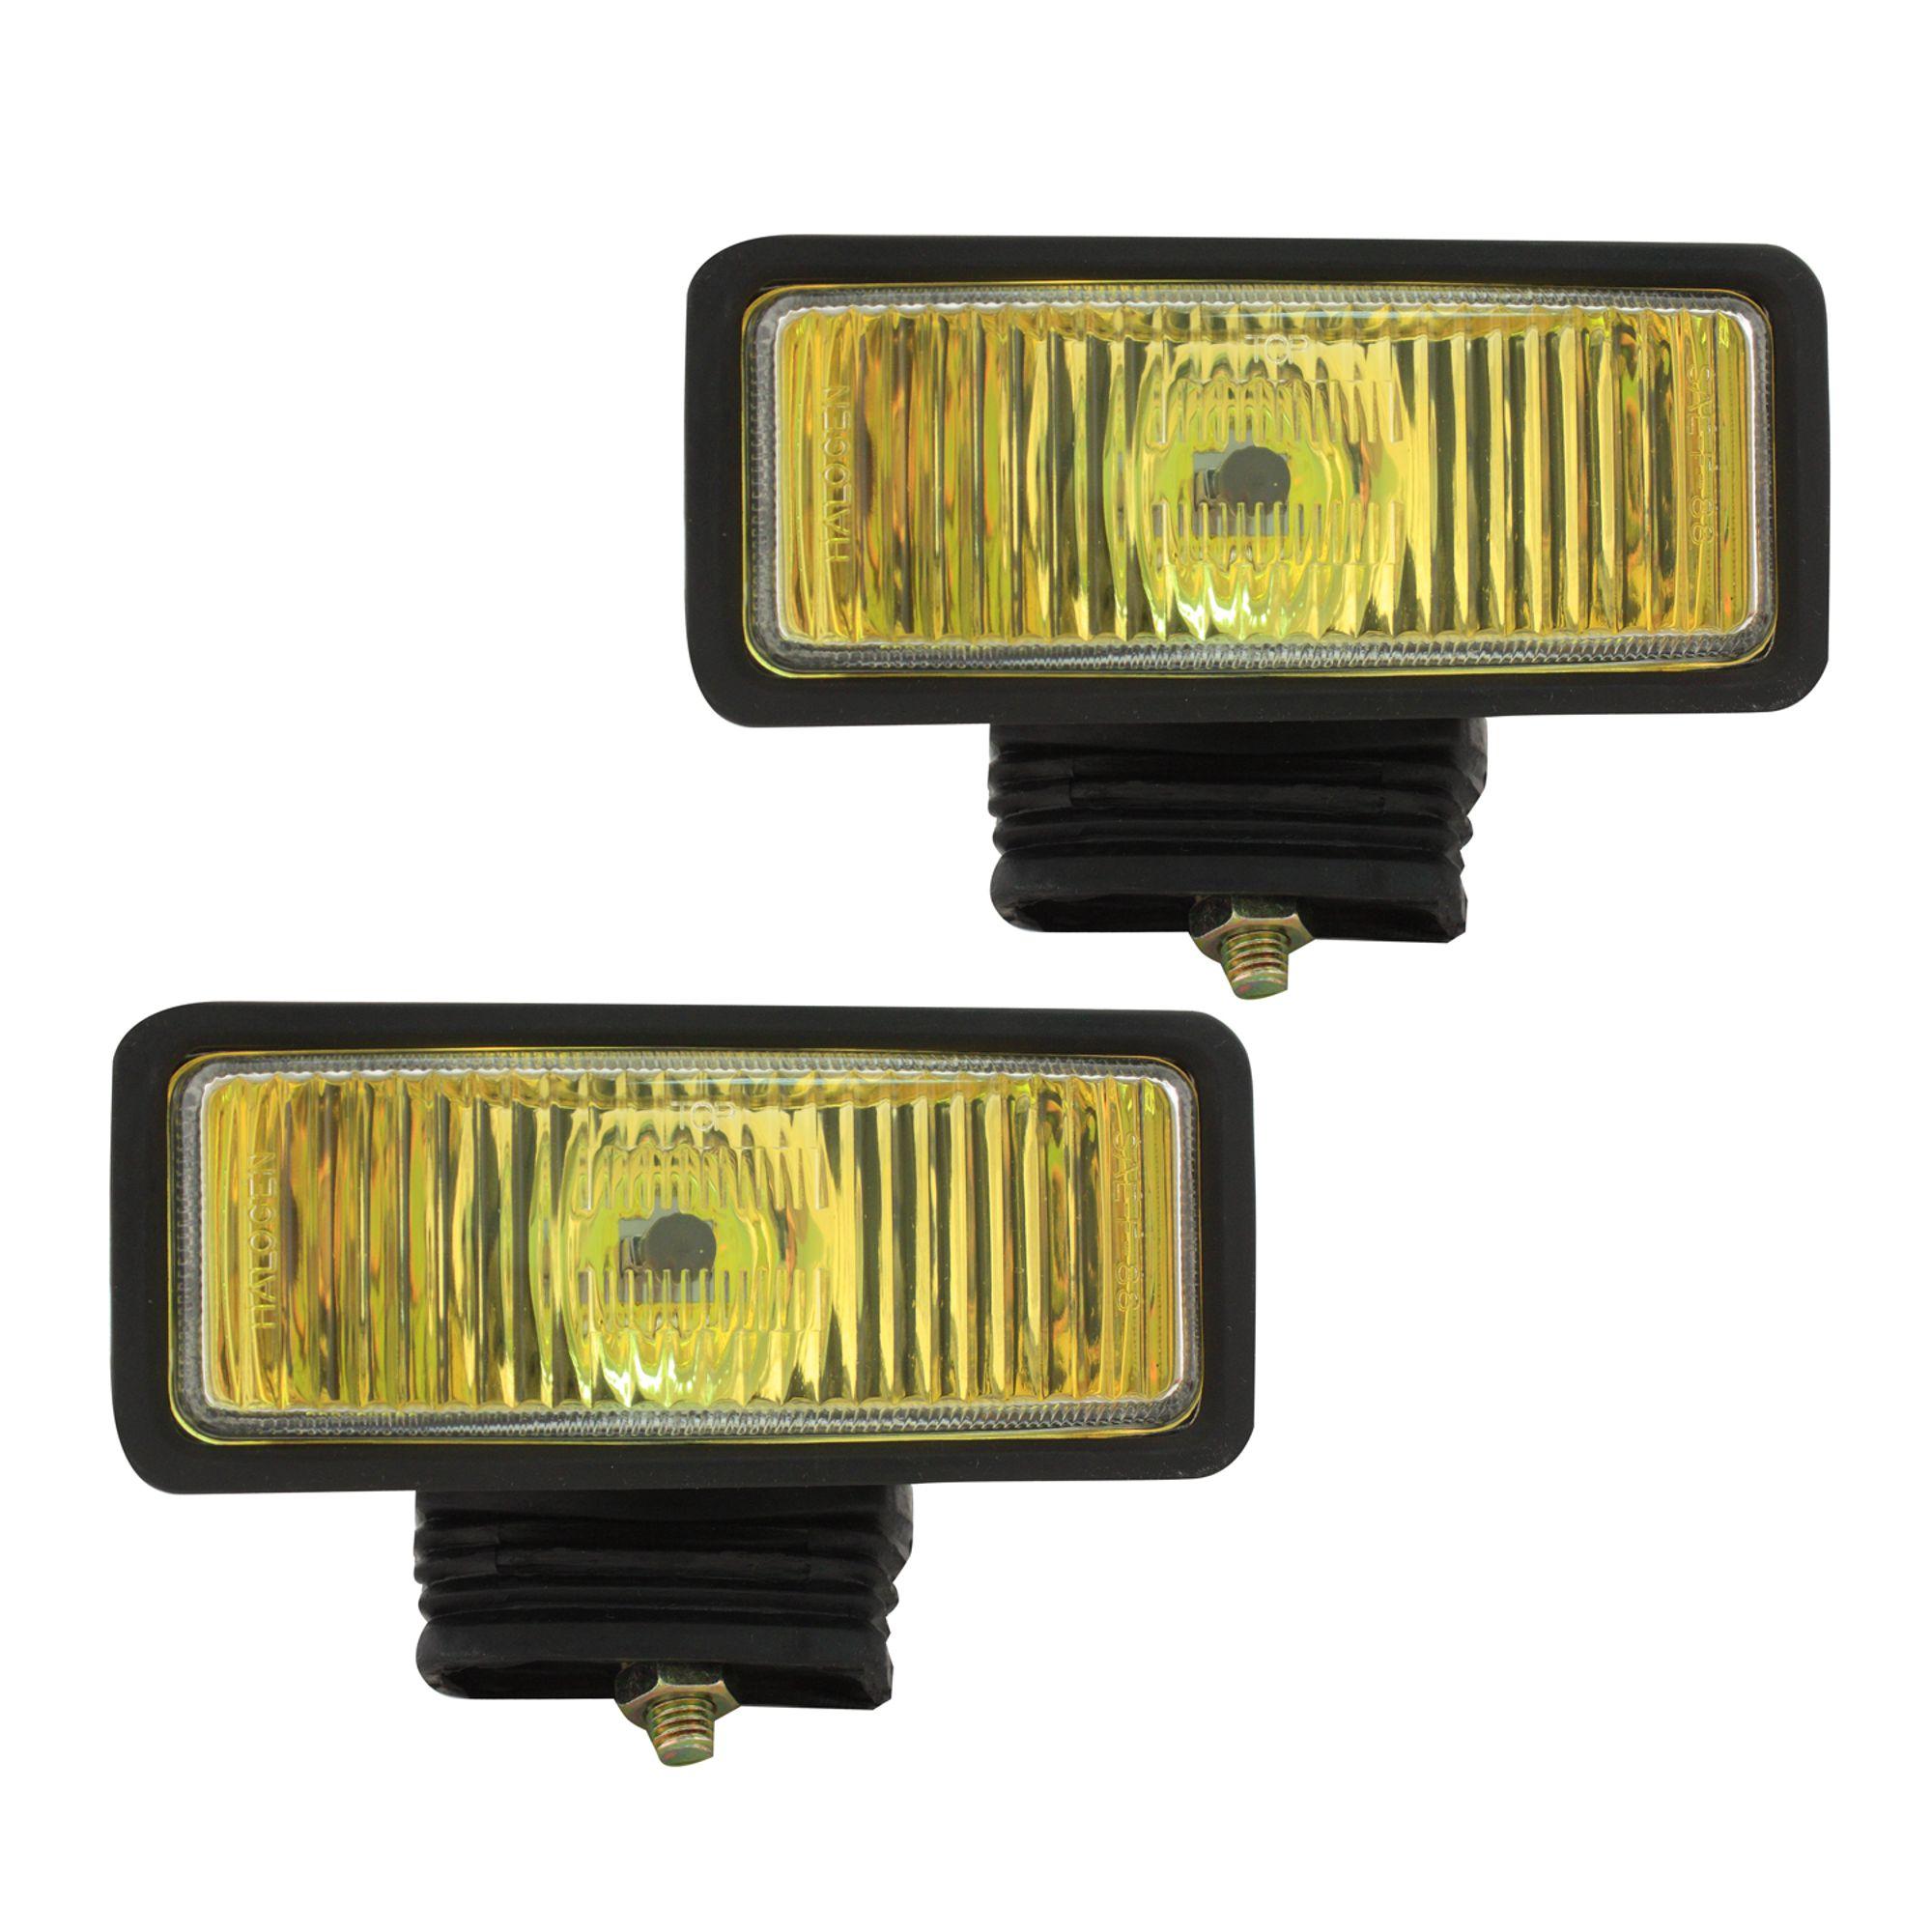 hight resolution of pilot automotive nv 104 2 x 6 h3 55 watt amber fog lights size 6 1 8 l x 2 1 4 x 2 1 8 walmart com